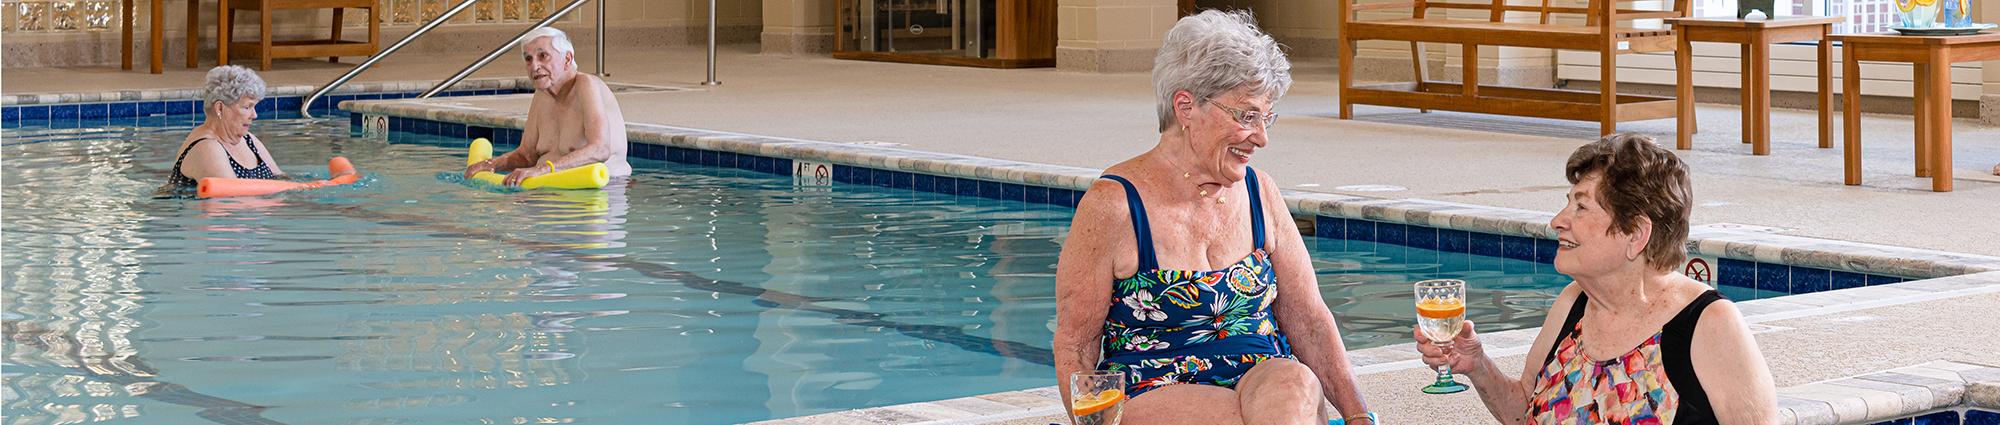 Senior adults enjoying a swim at The Chesapeake s indoor pool